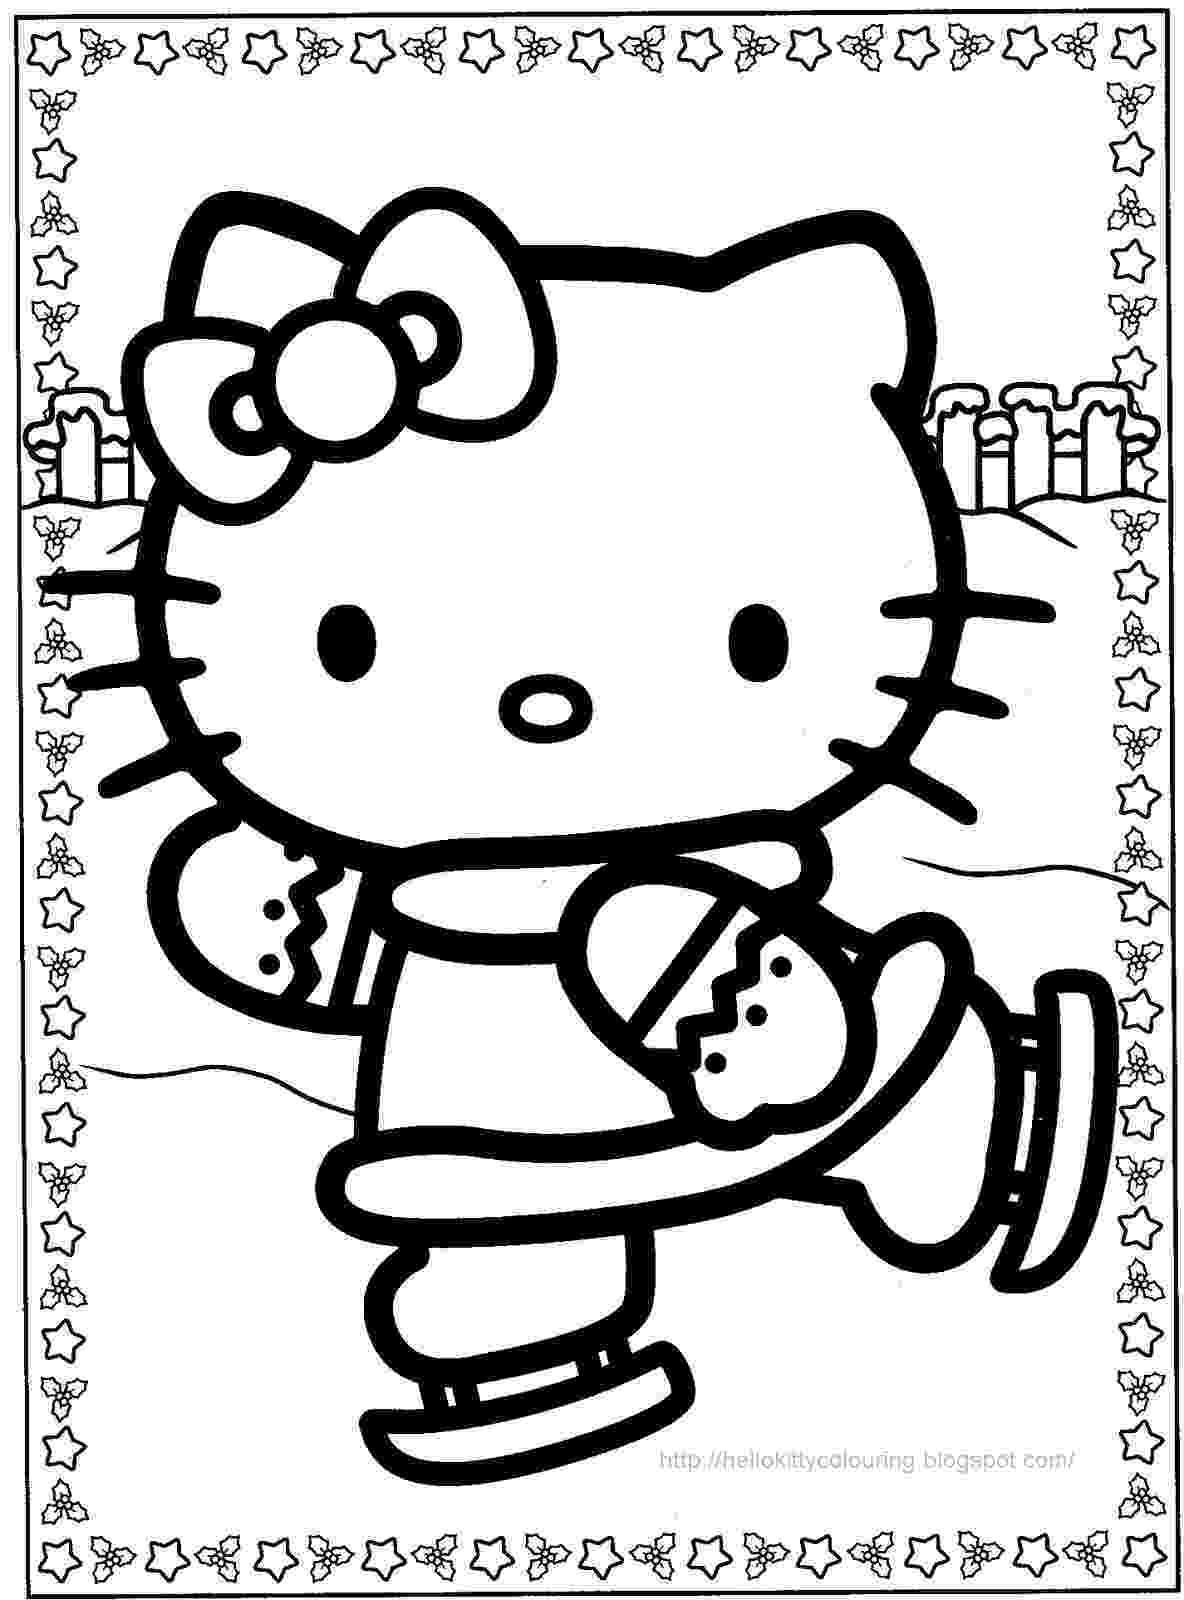 hello kitty coloring pages free bauzinho da web baÚ da web desenhos e riscos da hello hello coloring kitty free pages